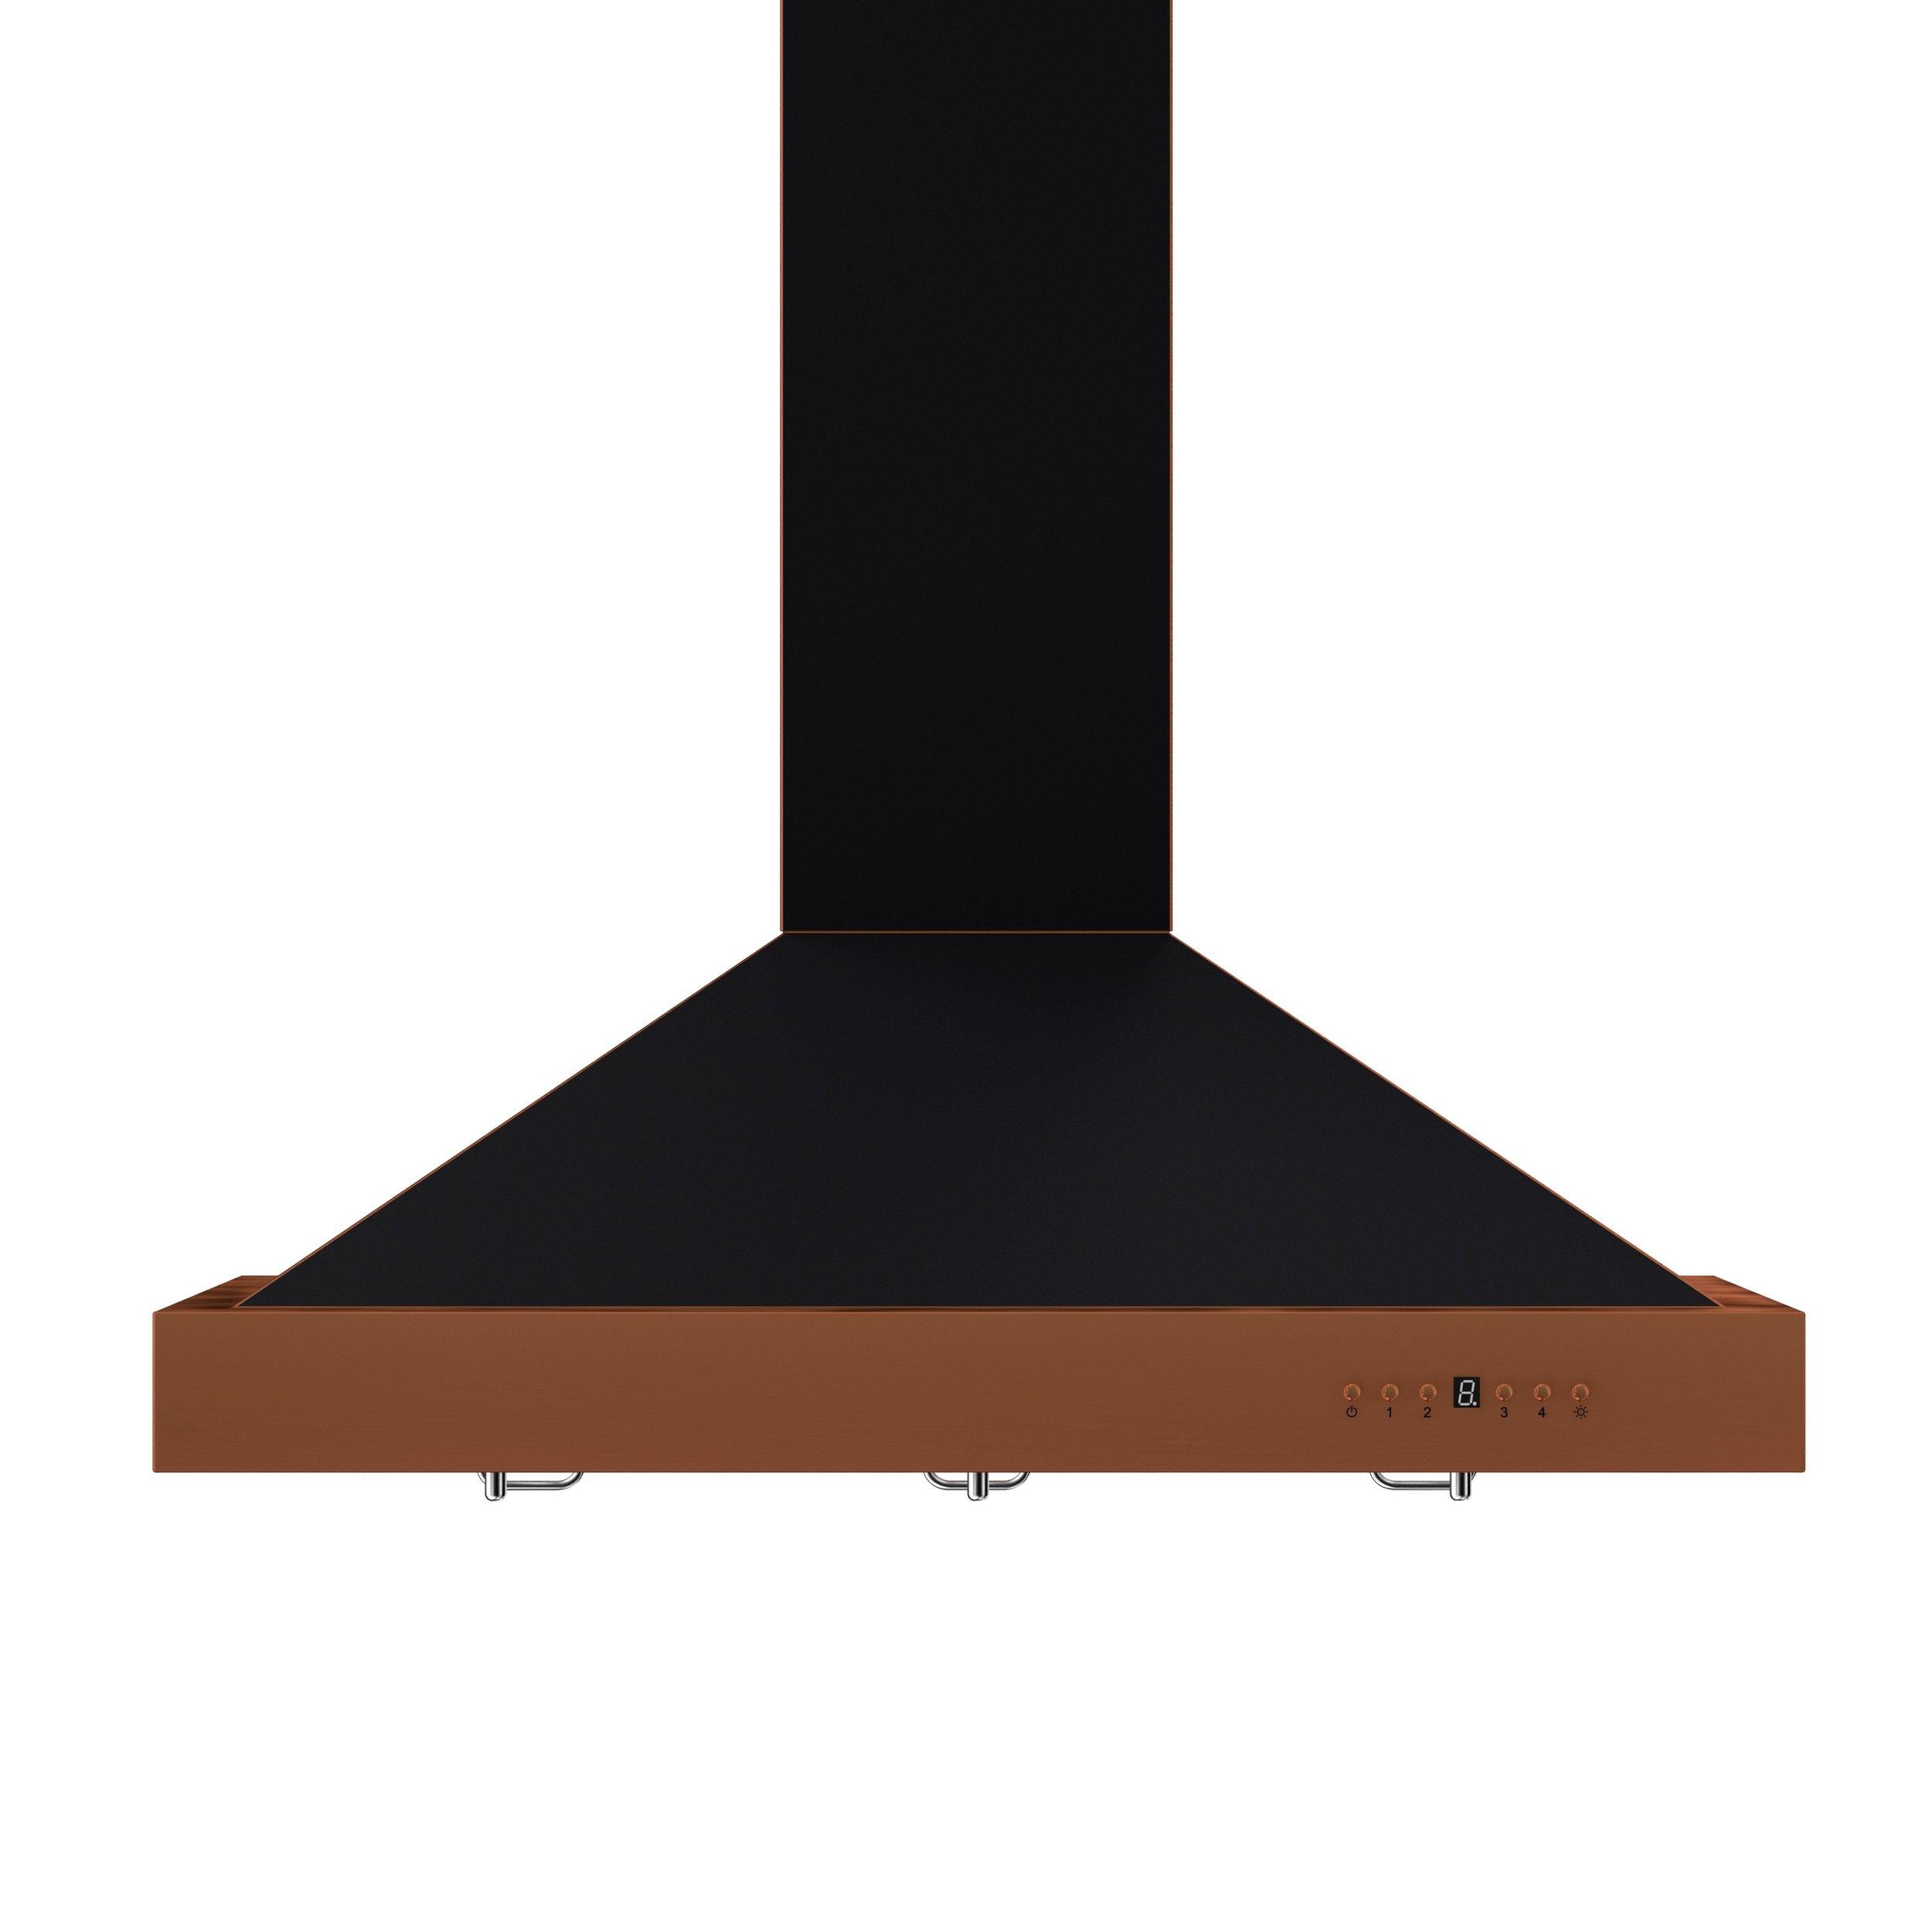 zline-copper-wall-mounted-range-hood-KB2-BCXXX-front.jpeg